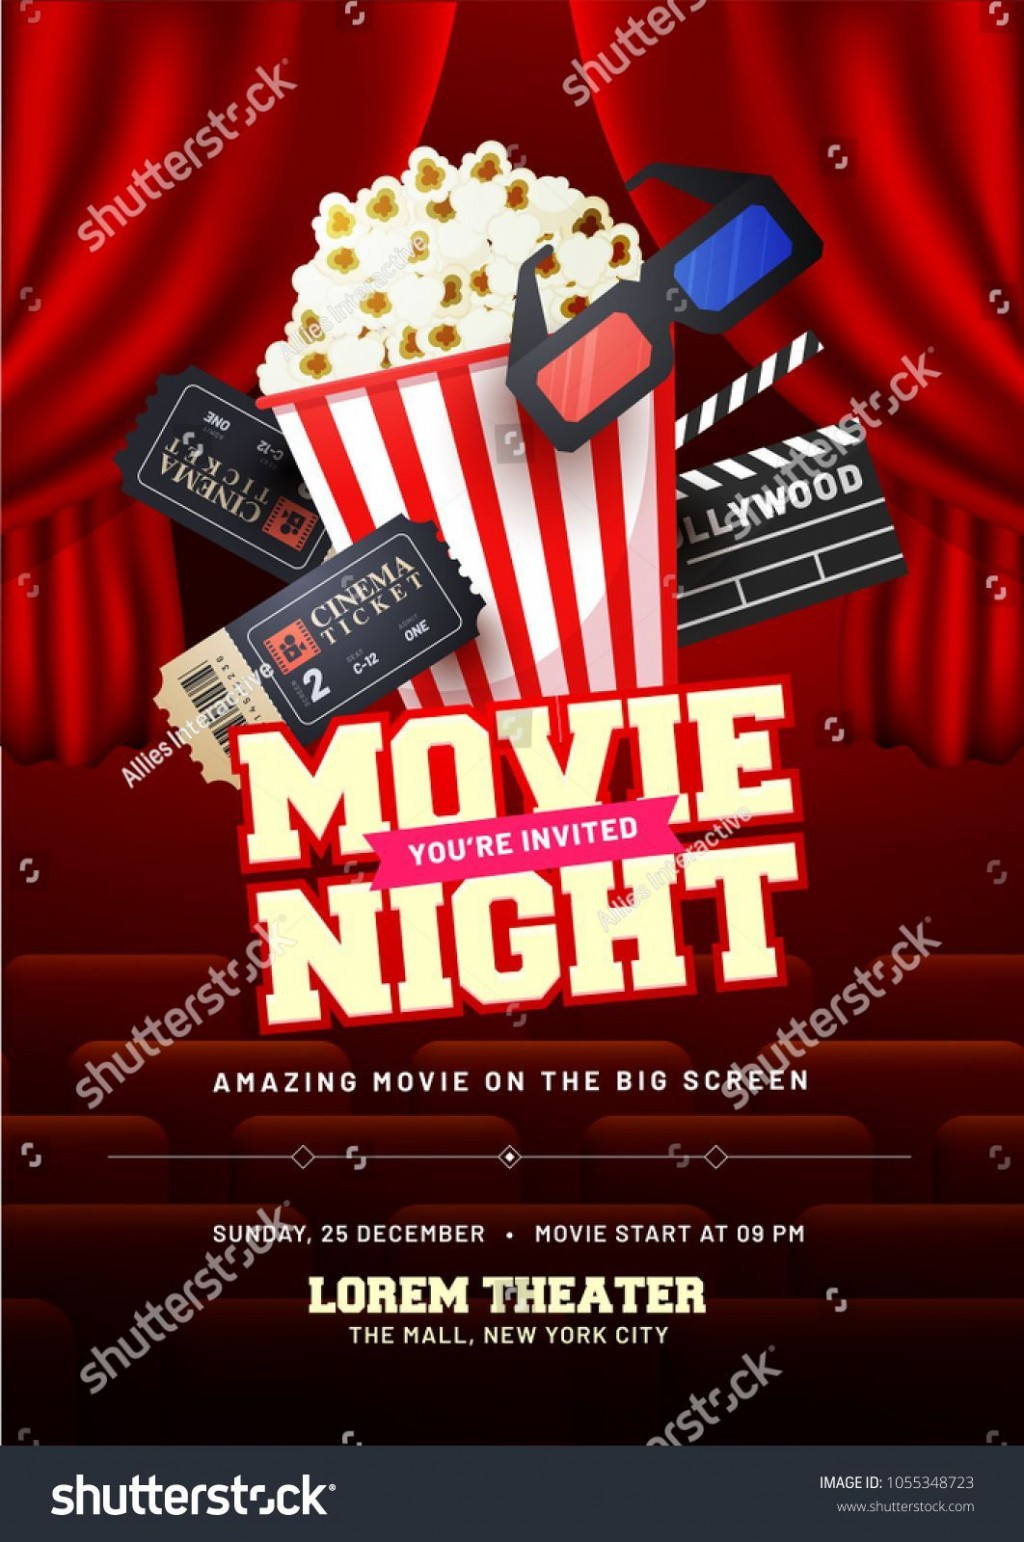 003 Stunning Movie Night Flyer Template Design  Templates Free Microsoft WordLarge